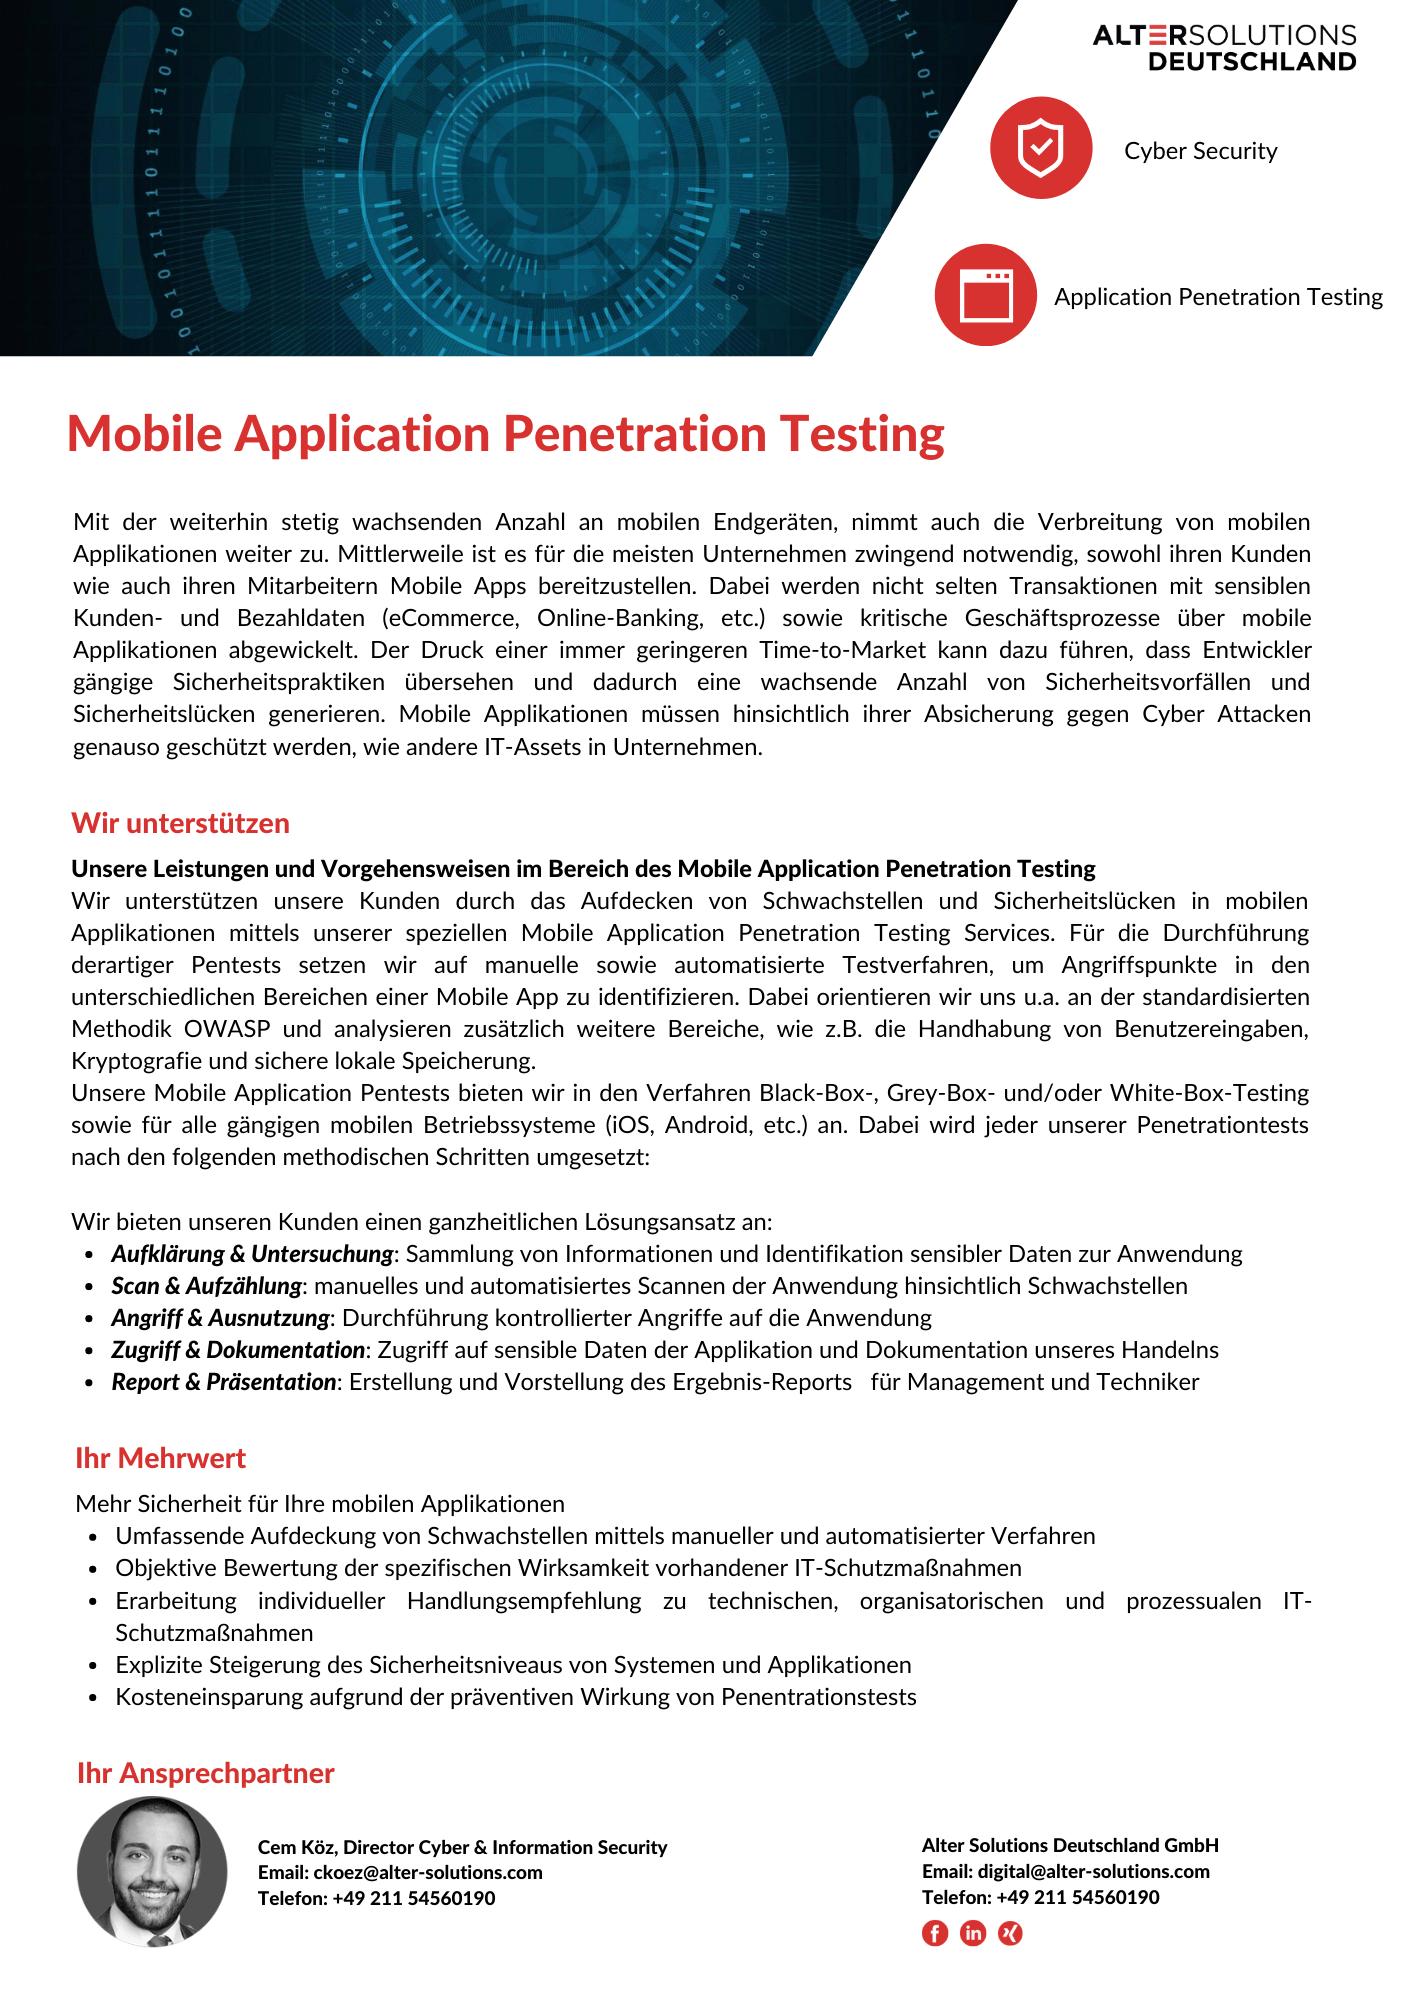 Mobile Application Penetration Testing Flyer